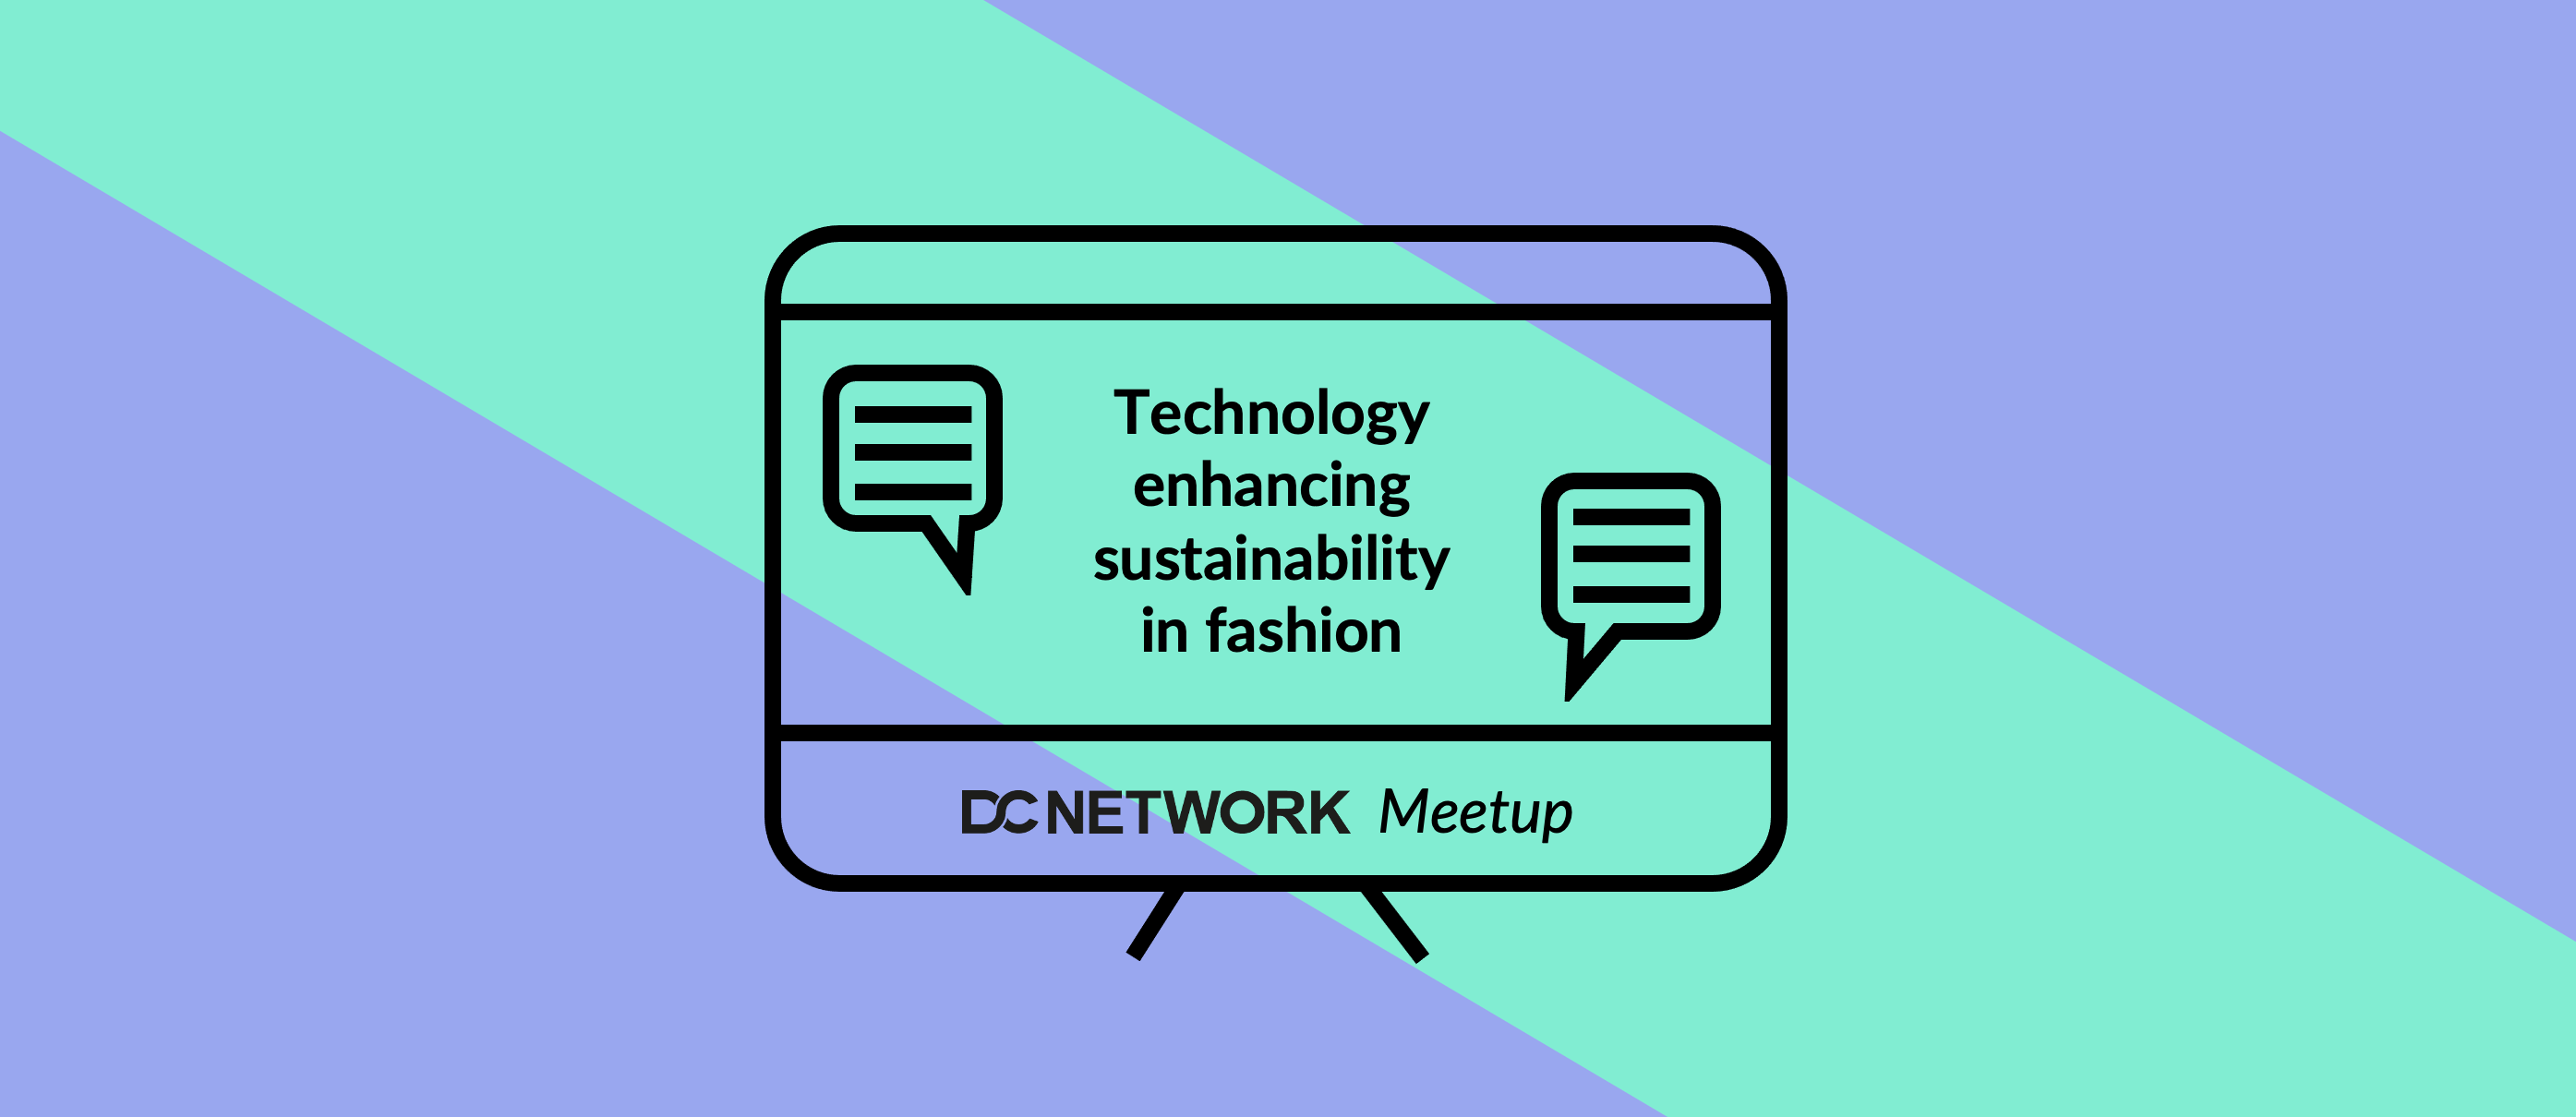 Technology enhancing sustainability in fashion